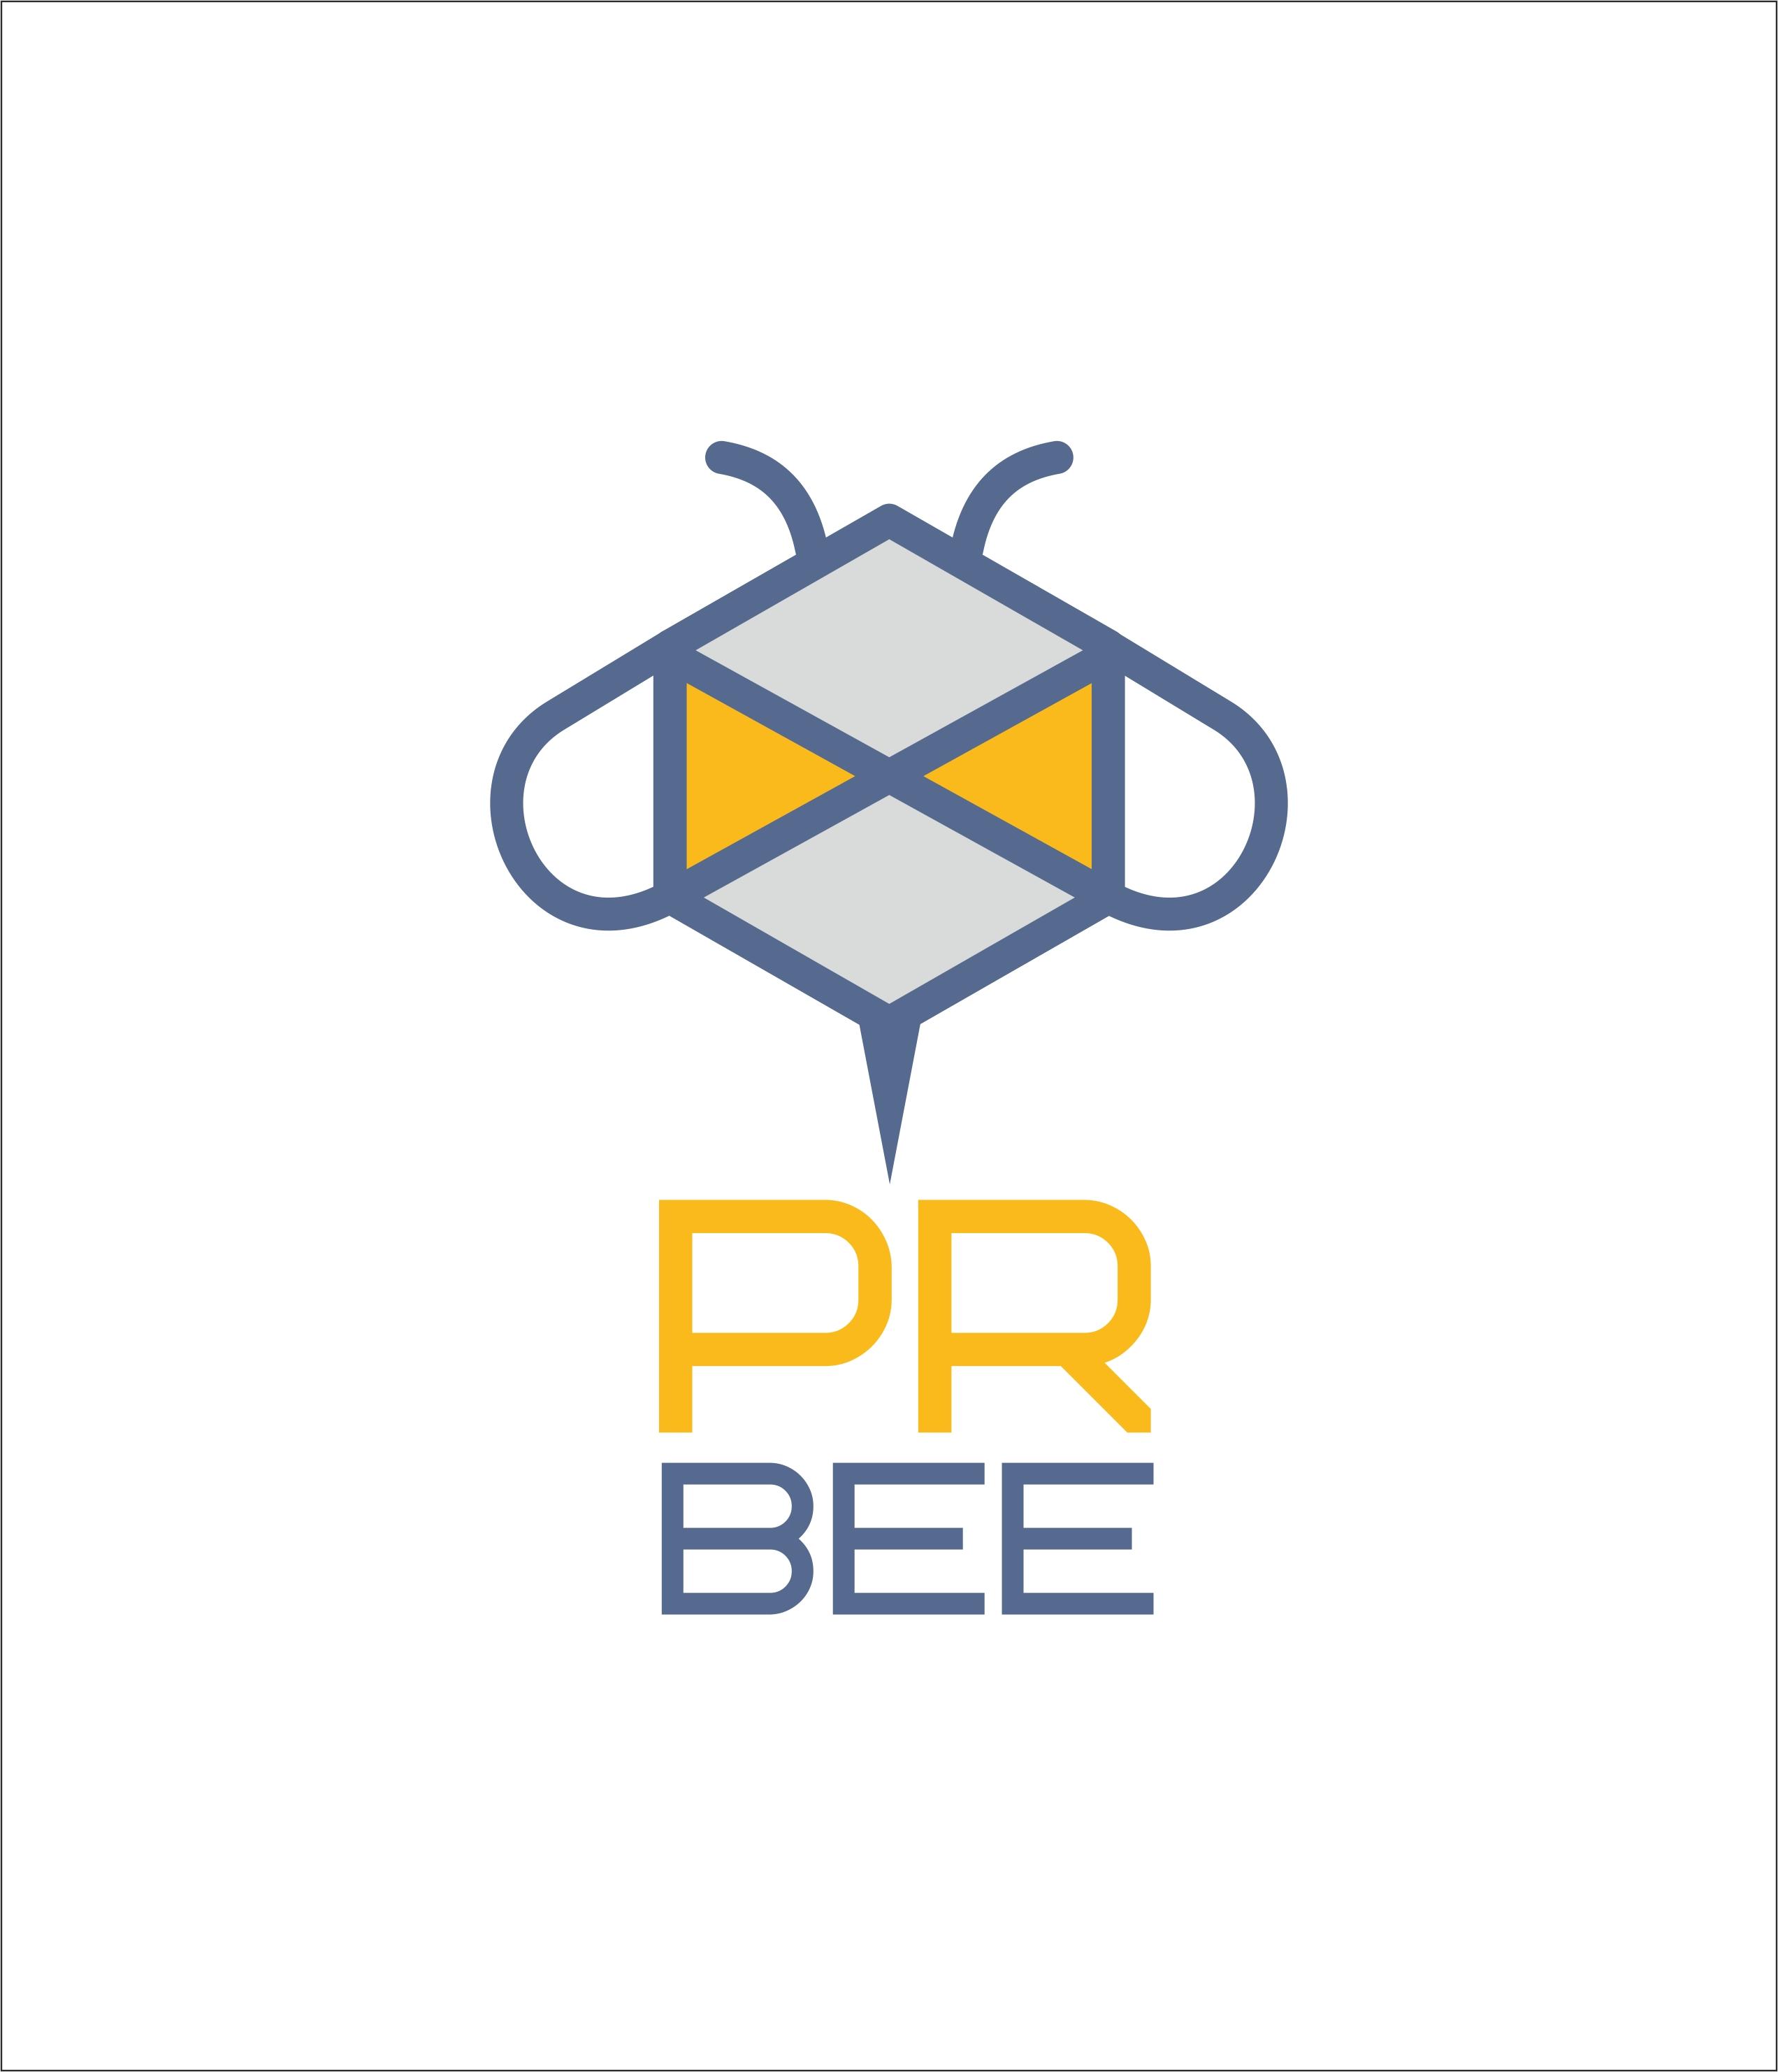 PRBEE